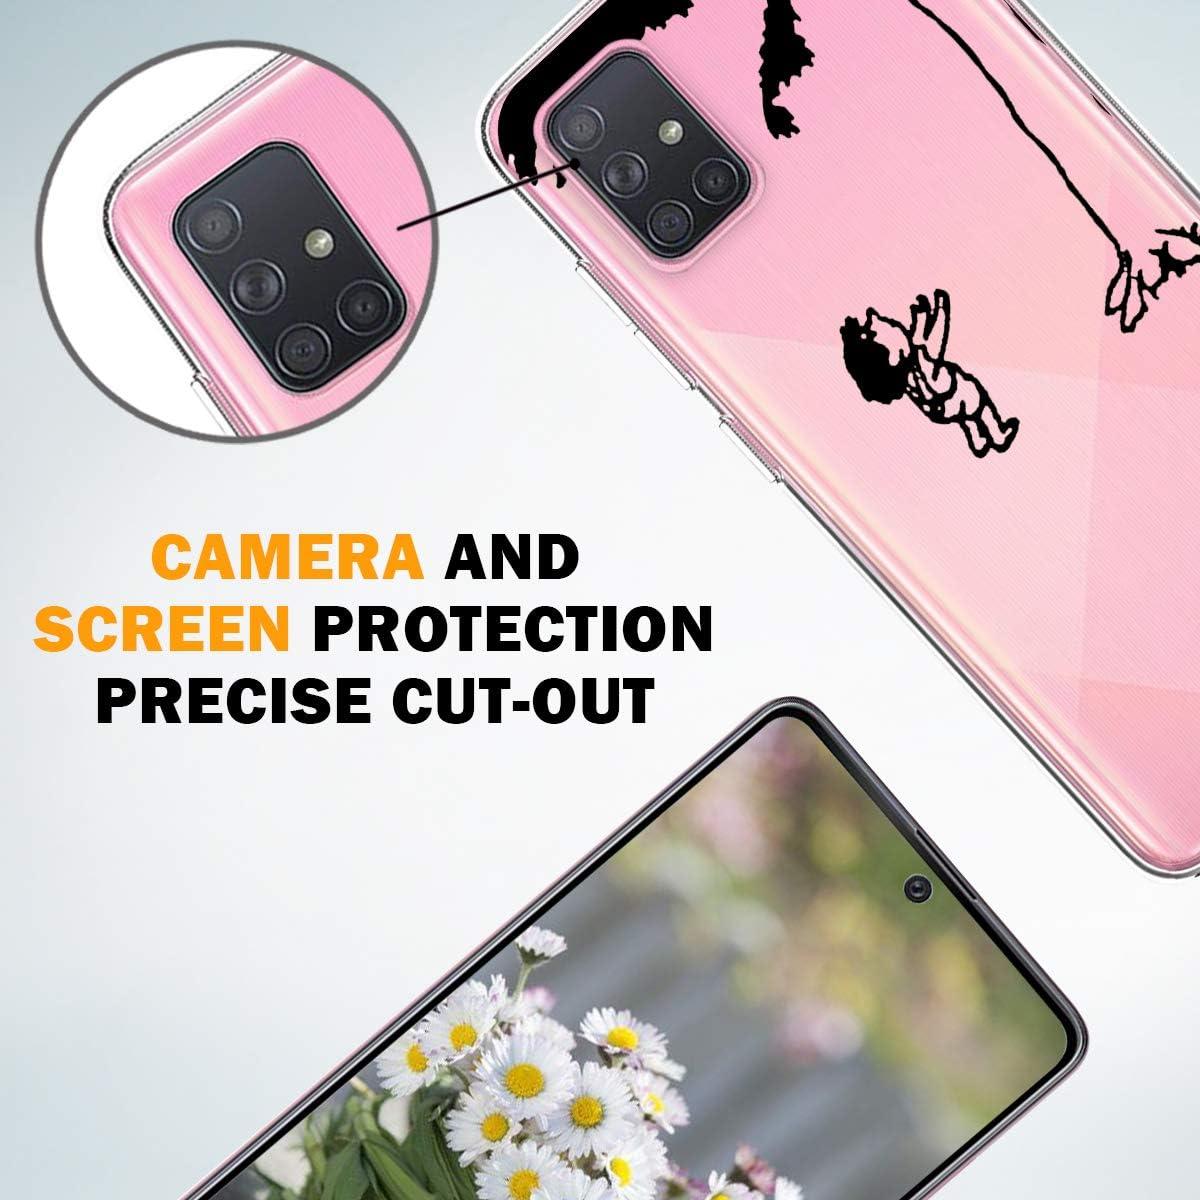 A71 H/üllen Original Design Durchsichtige Galaxy A71 Tasche Croazhi f/ür Handyh/ülle Samsung Galaxy A71 H/ülle Transparent Marmor Silikon Cover A71 H/ülle Blume Schutzh/ülle Case